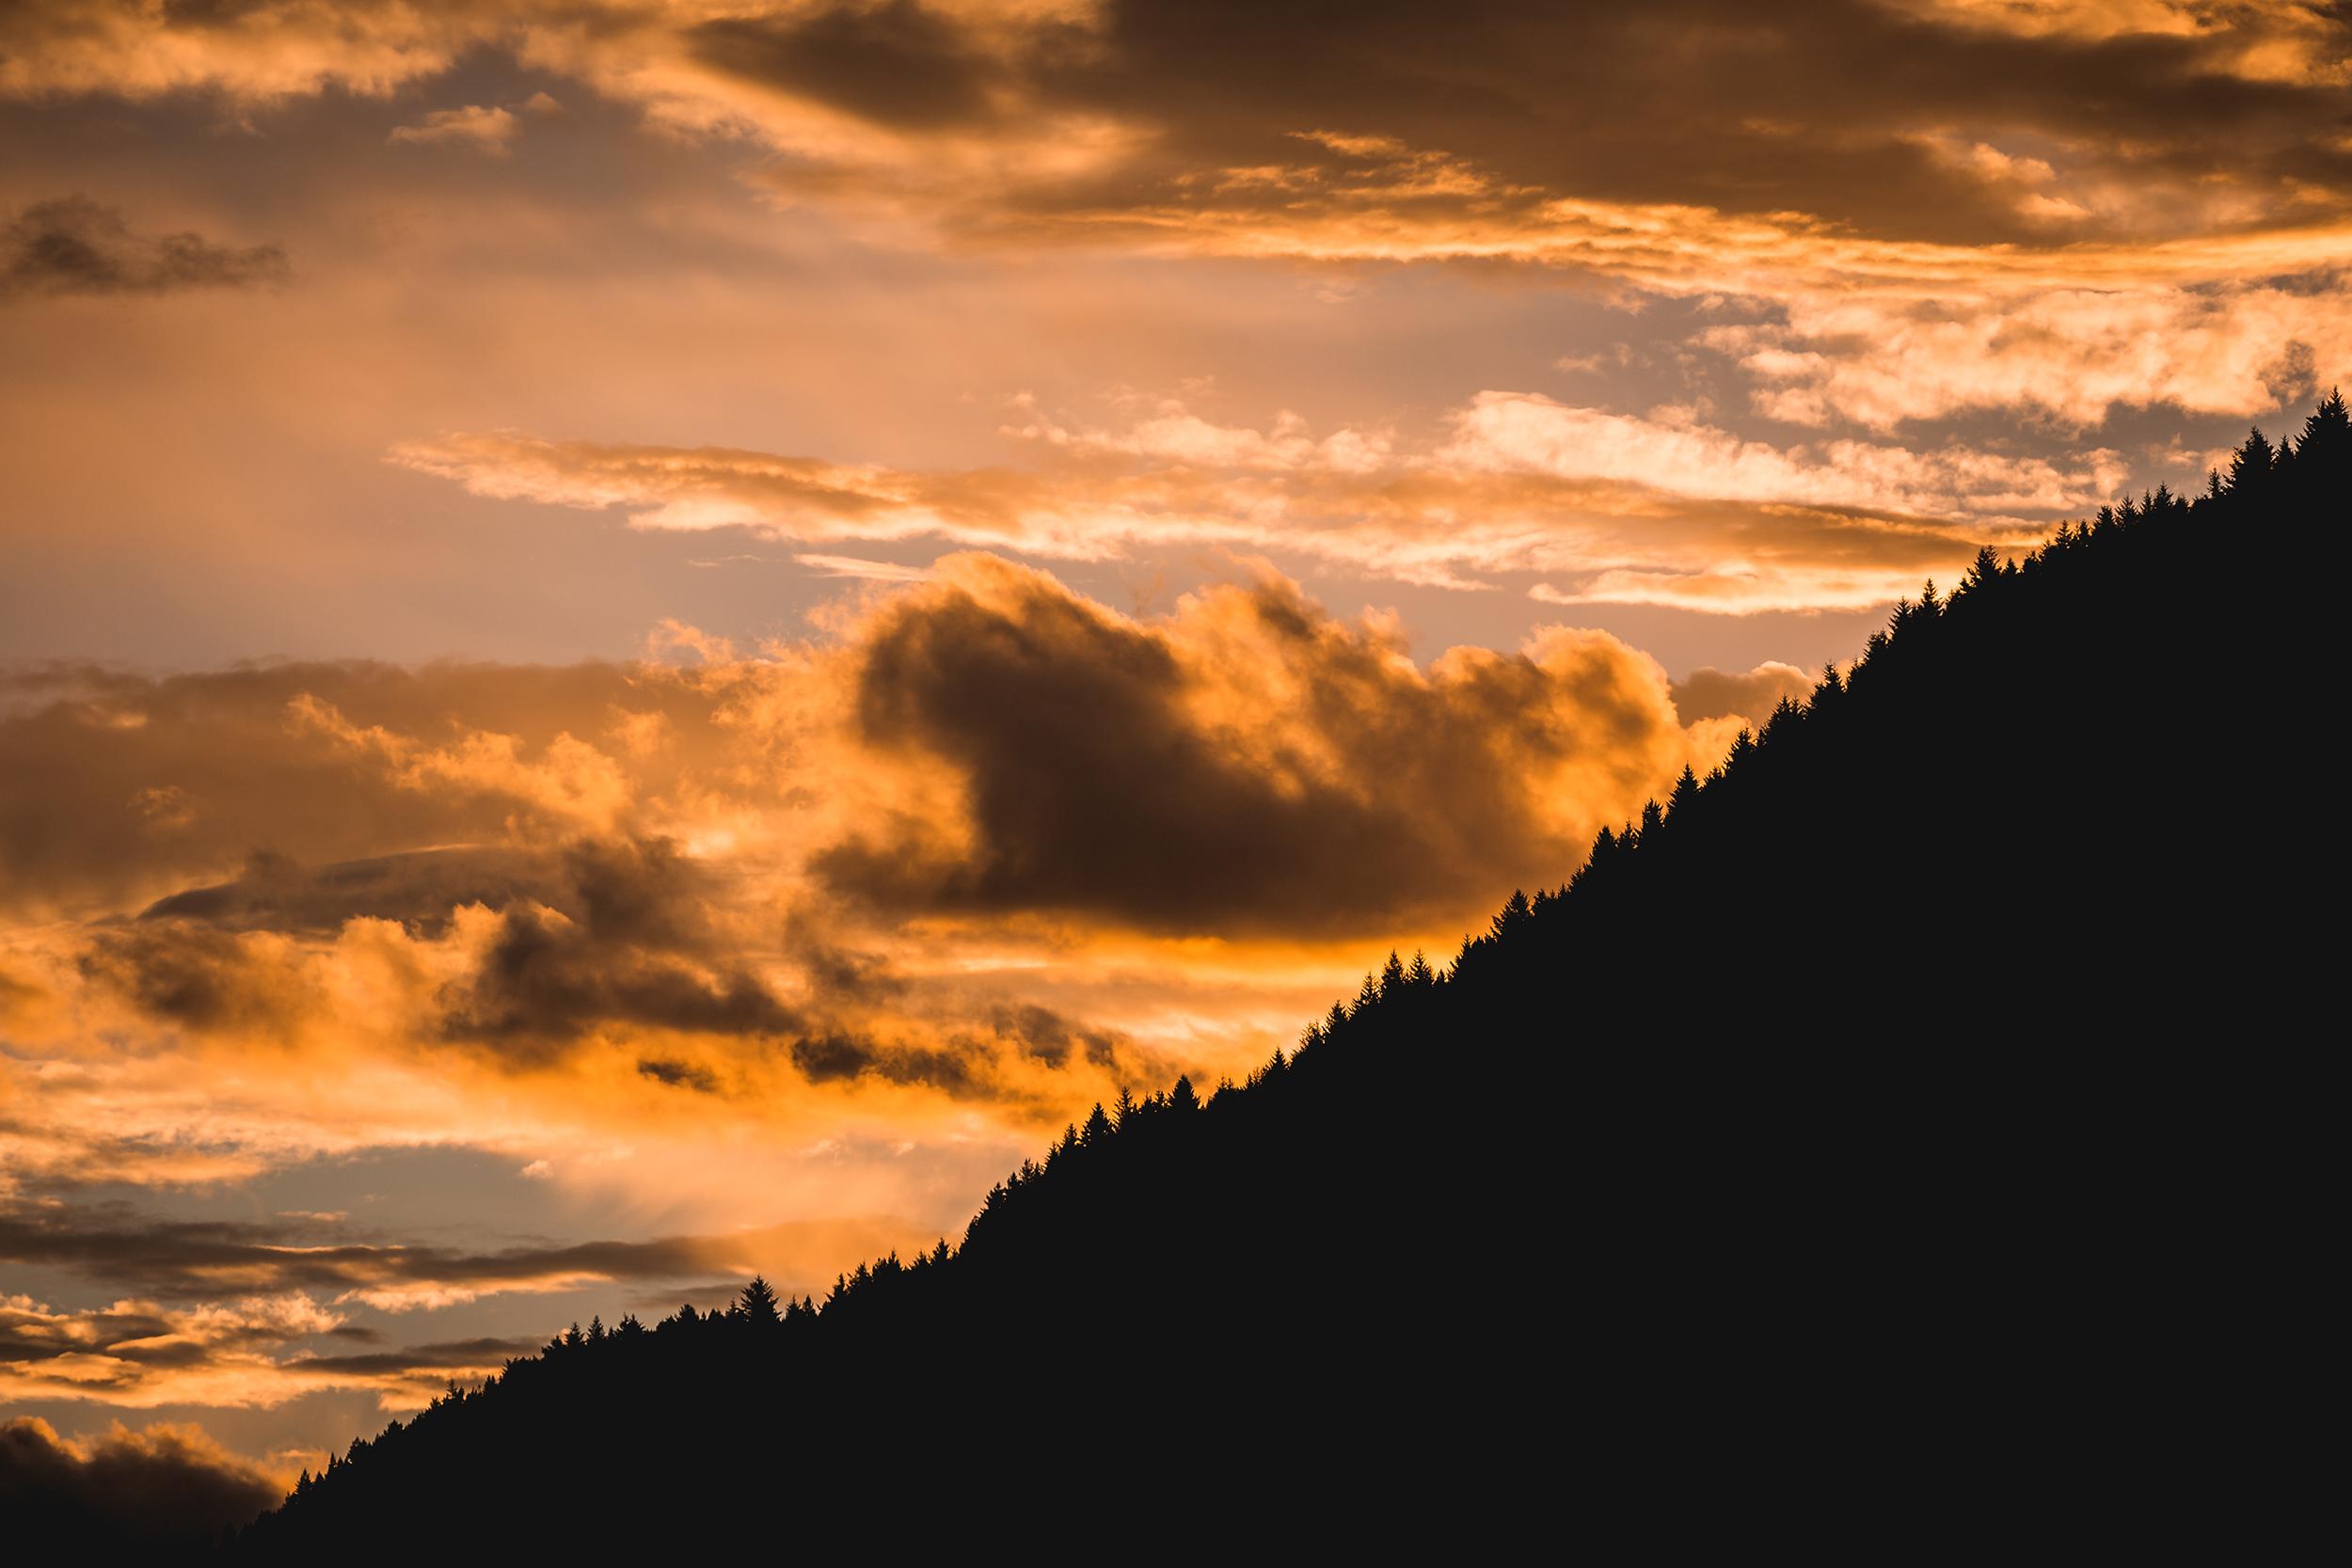 Skies on Fire. Queenstown, NZ